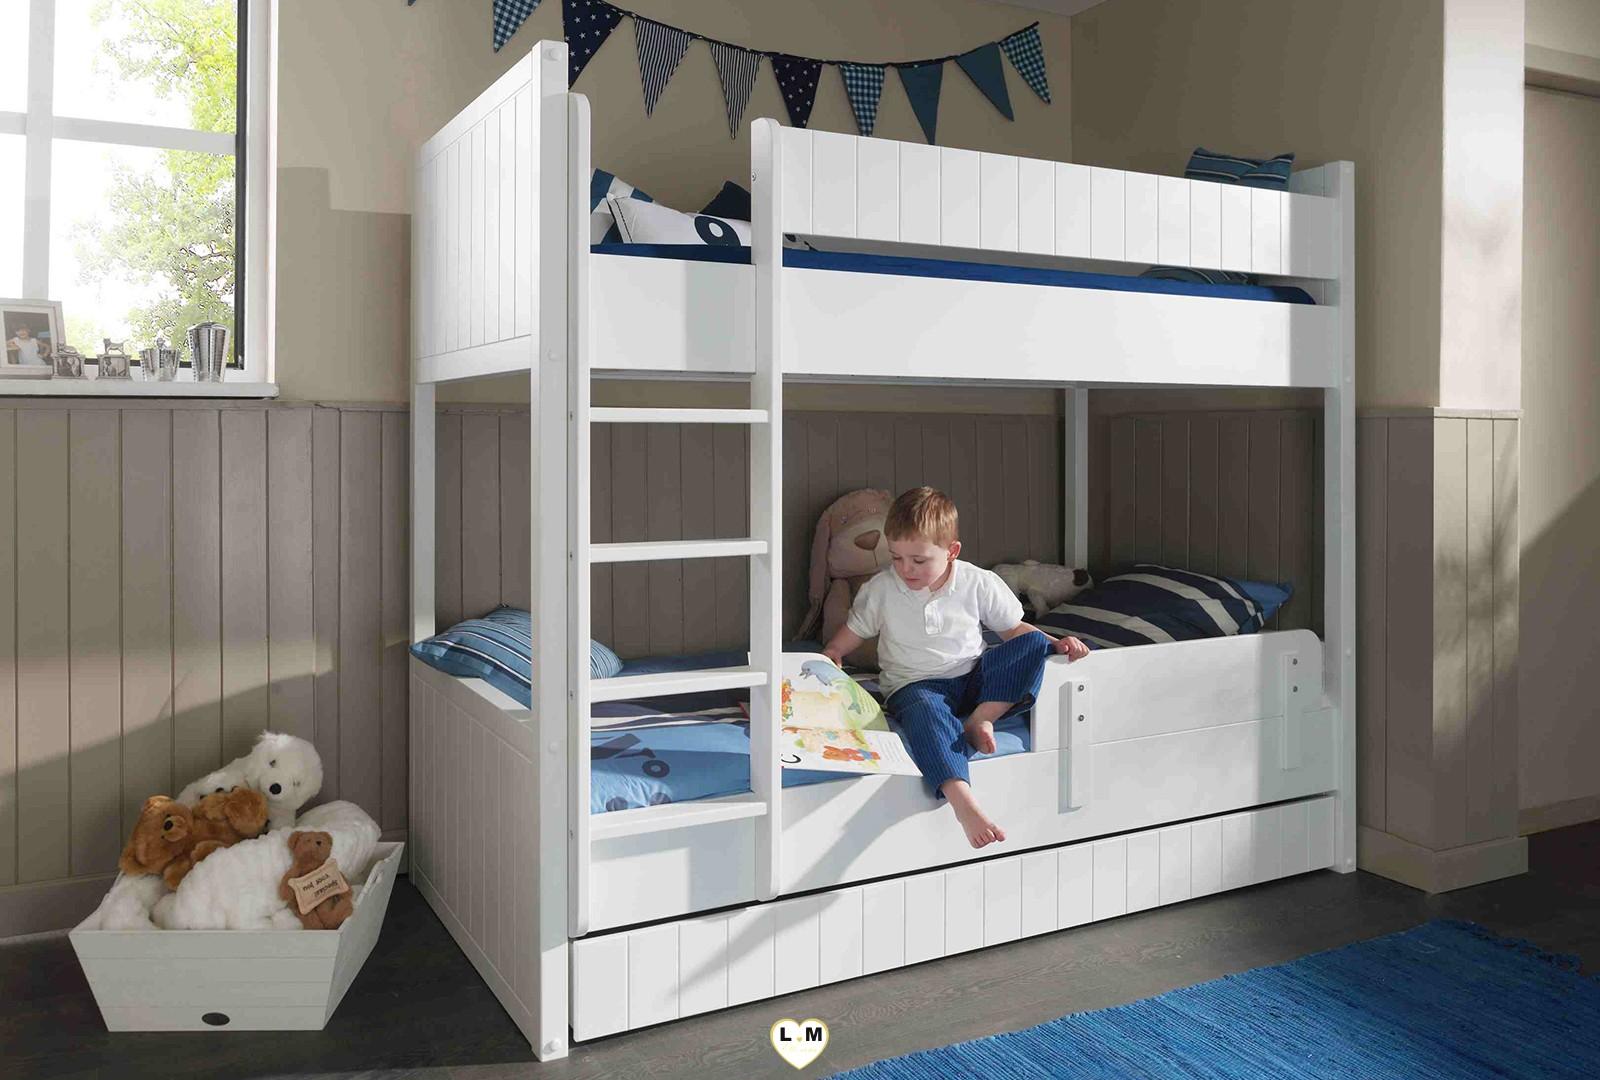 robinson chambre ado la barriere securite de lit lignemeuble com. Black Bedroom Furniture Sets. Home Design Ideas